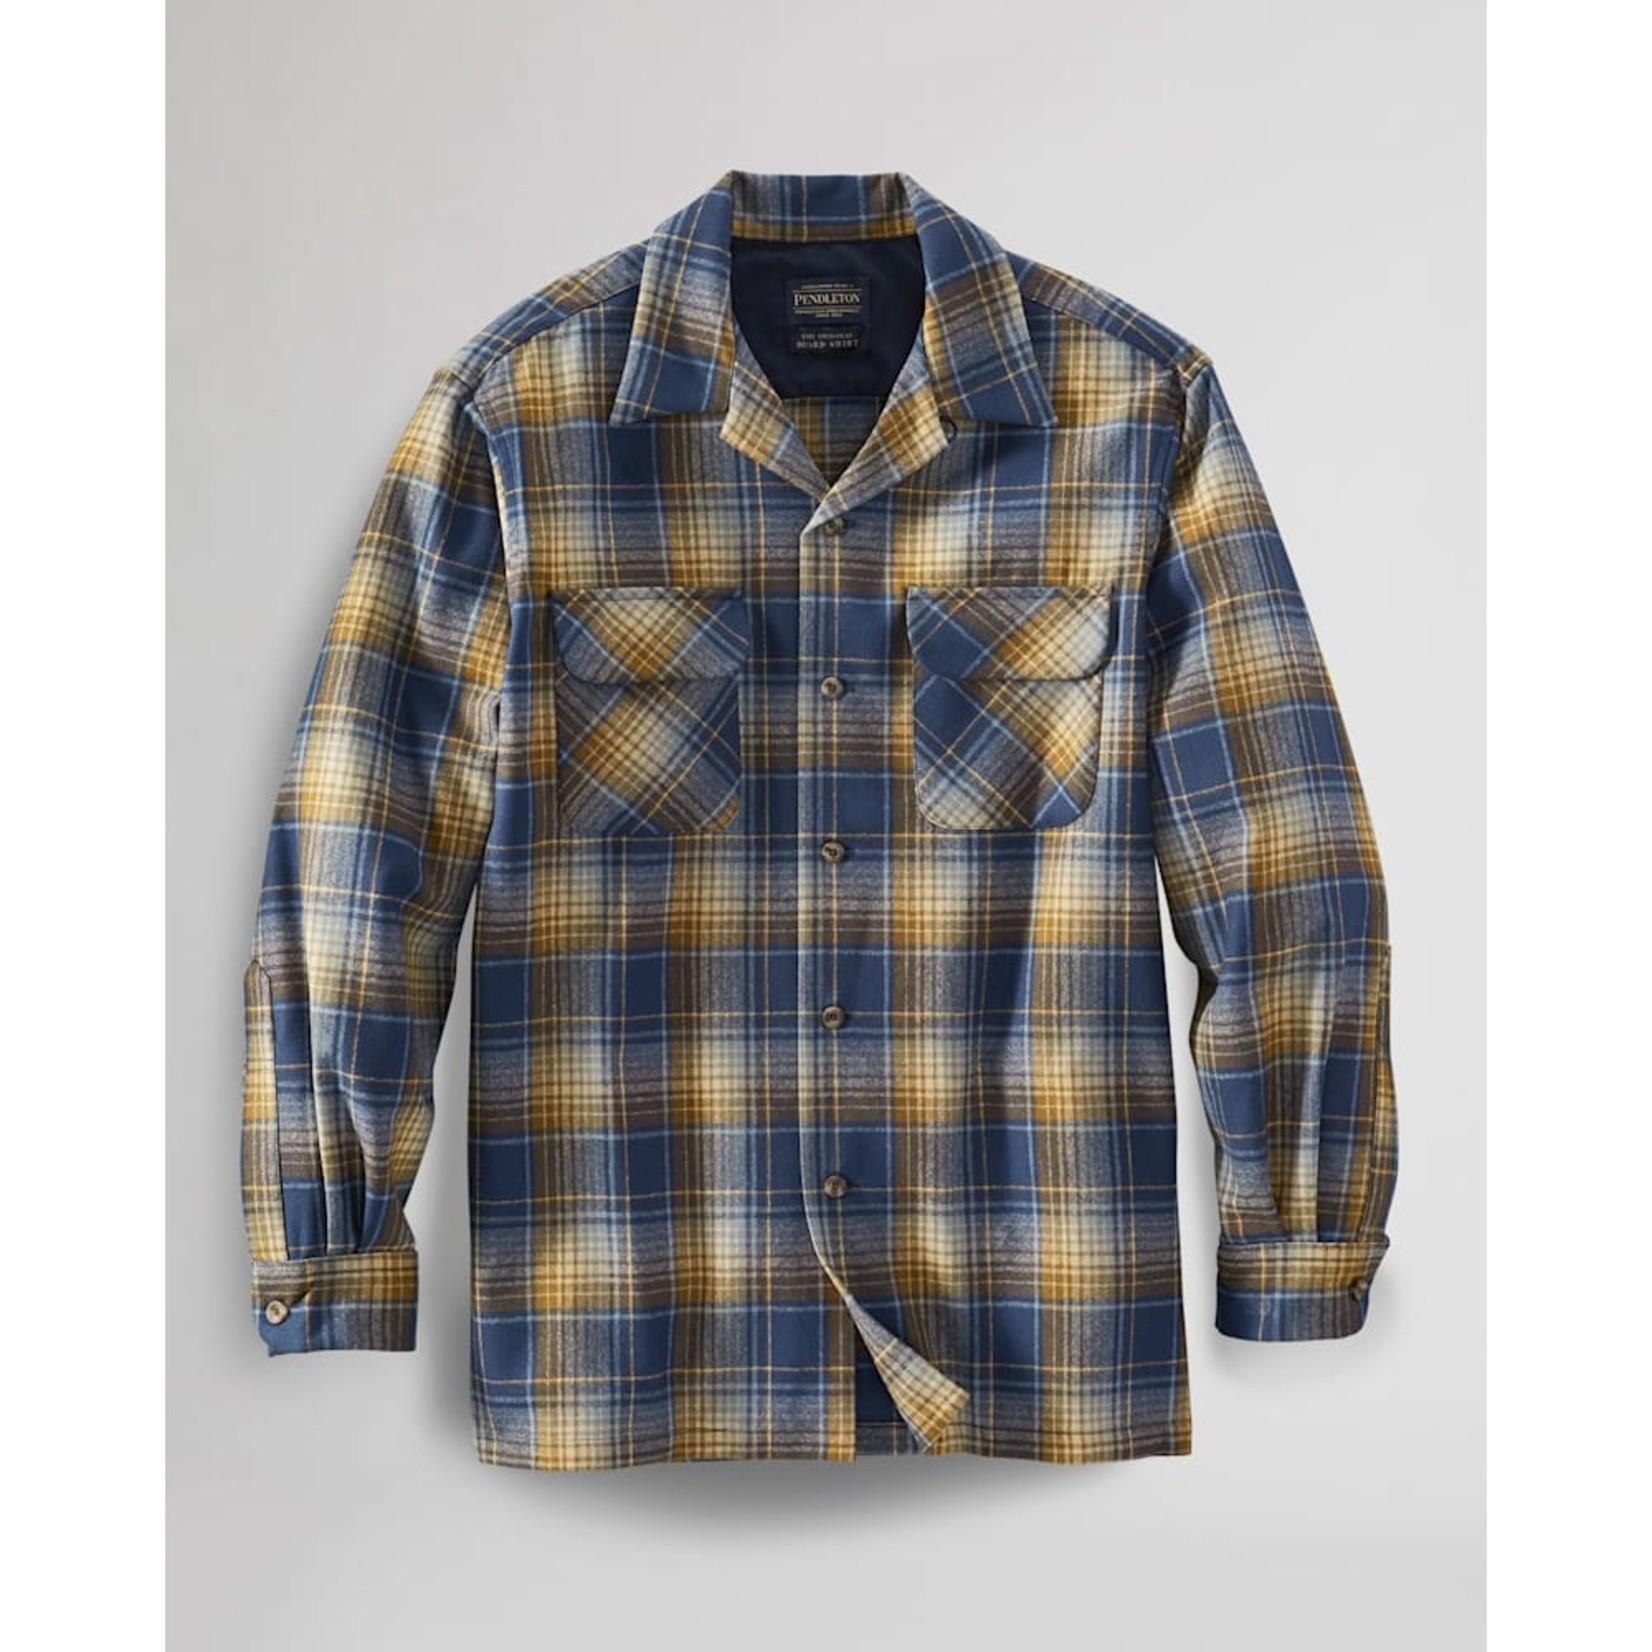 Pendleton Pendleton Board Shirt AA022-32416